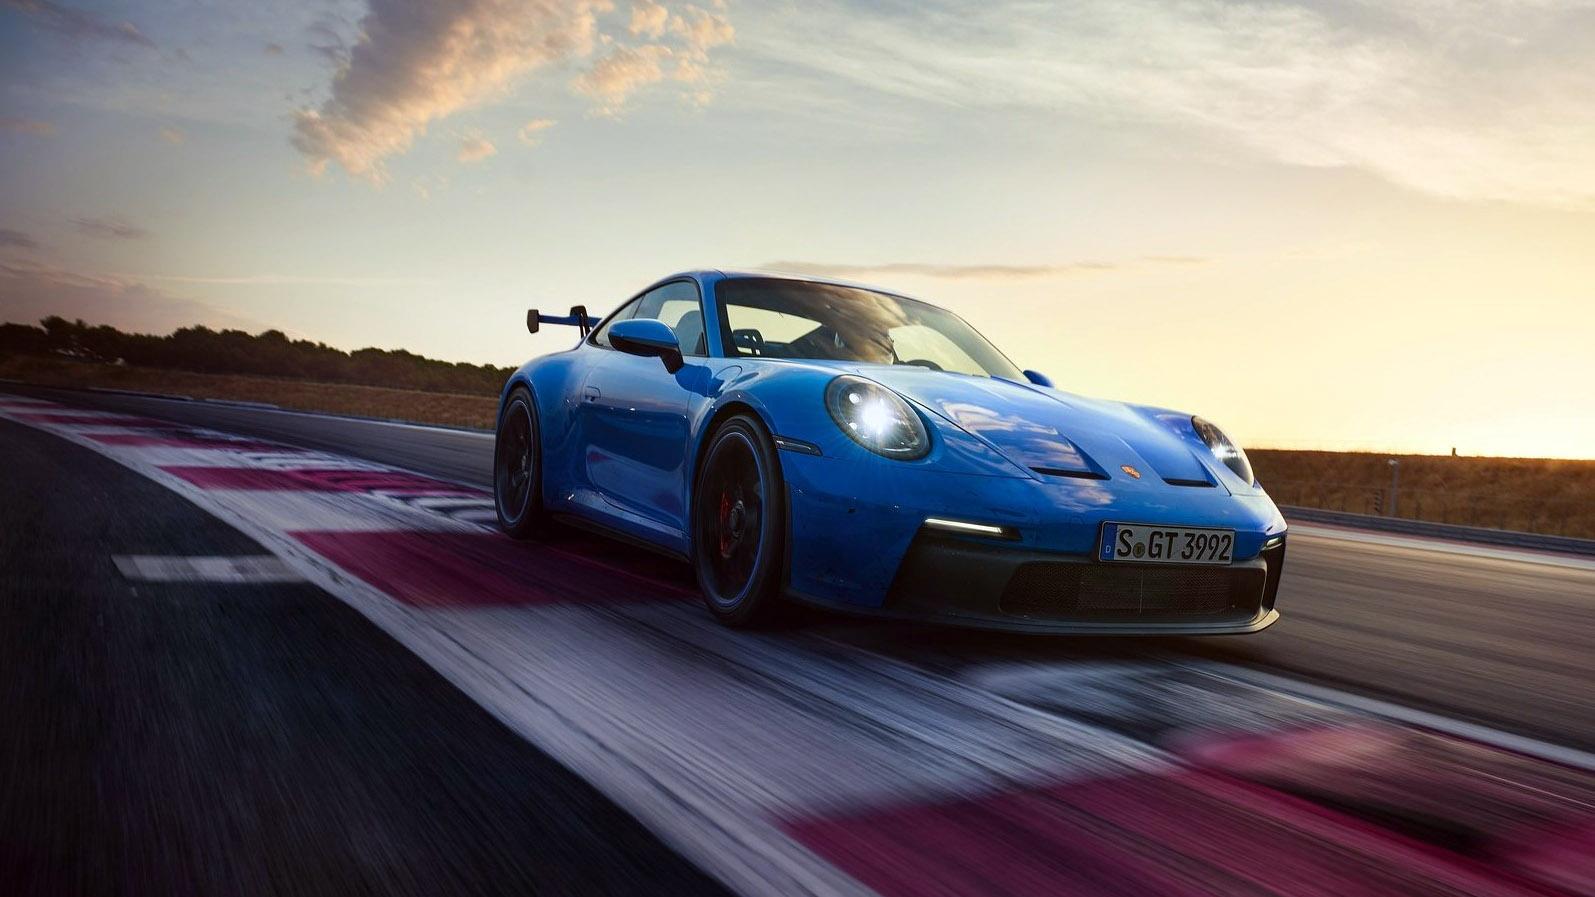 H Volkswagen θέλει να πουλήσει τις μετοχές της στην Porsche